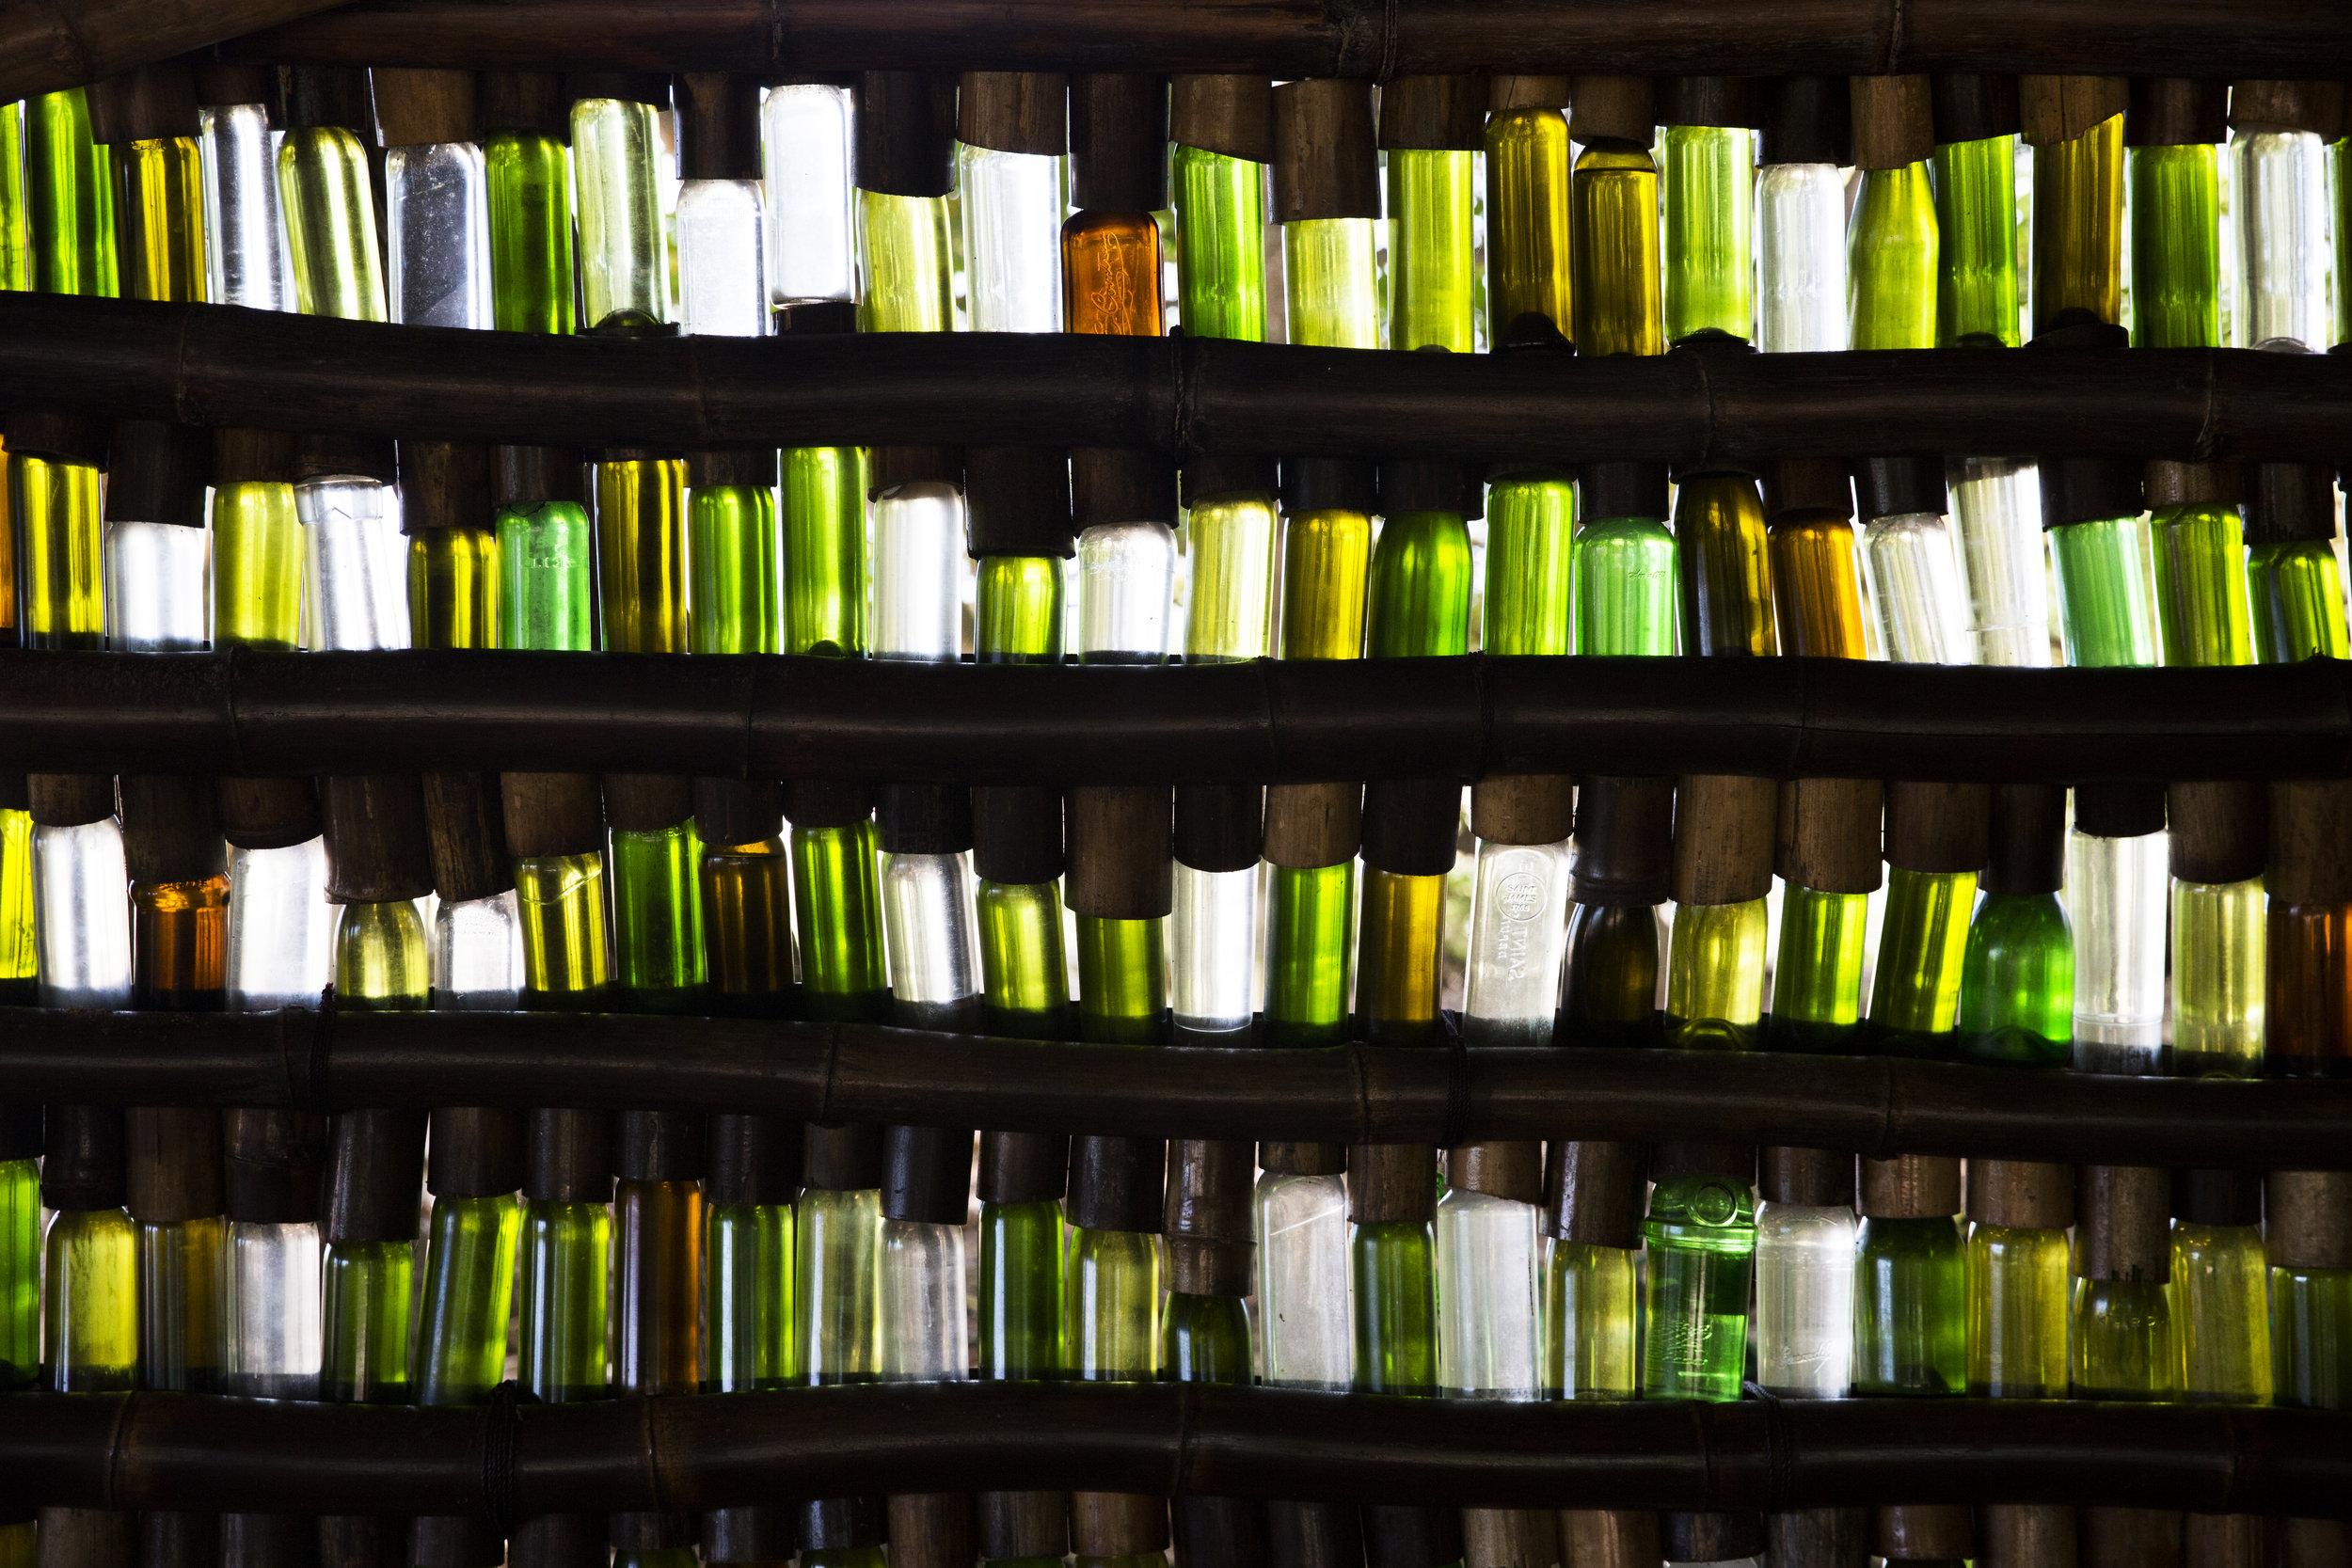 Glass bottles reused as bar decoration